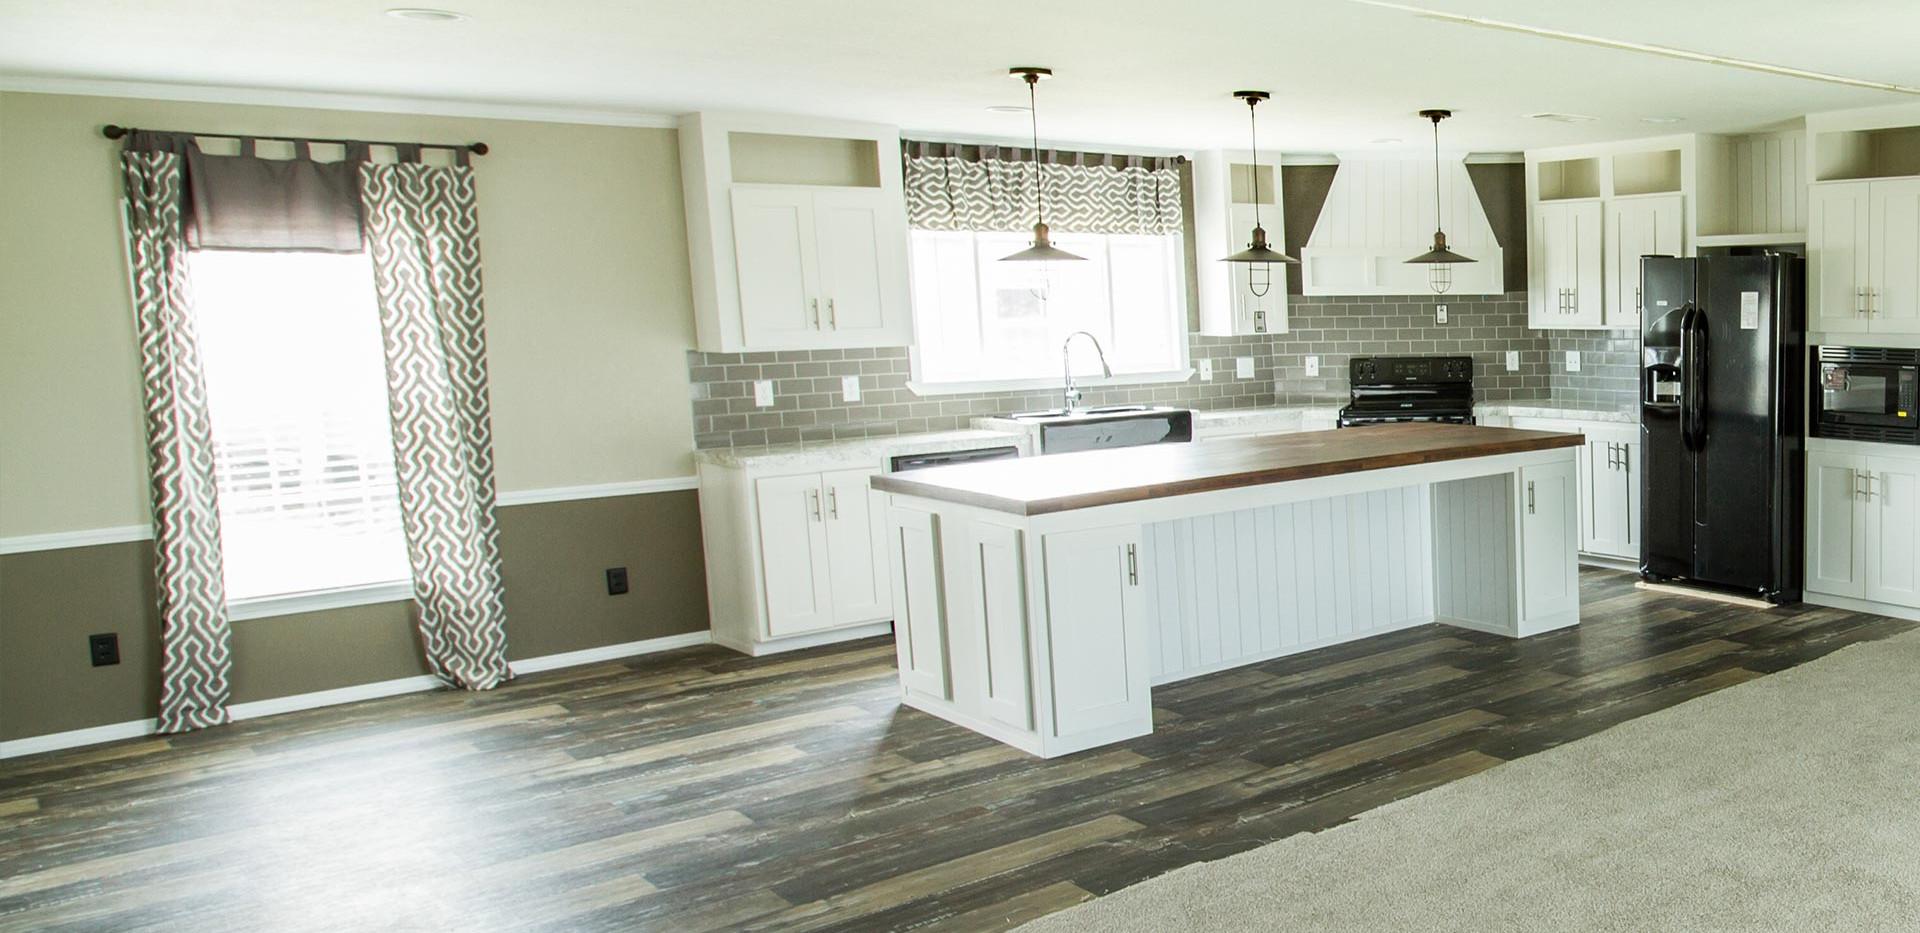 Fossil-Creek-The-Drake-kitchen-5.jpg